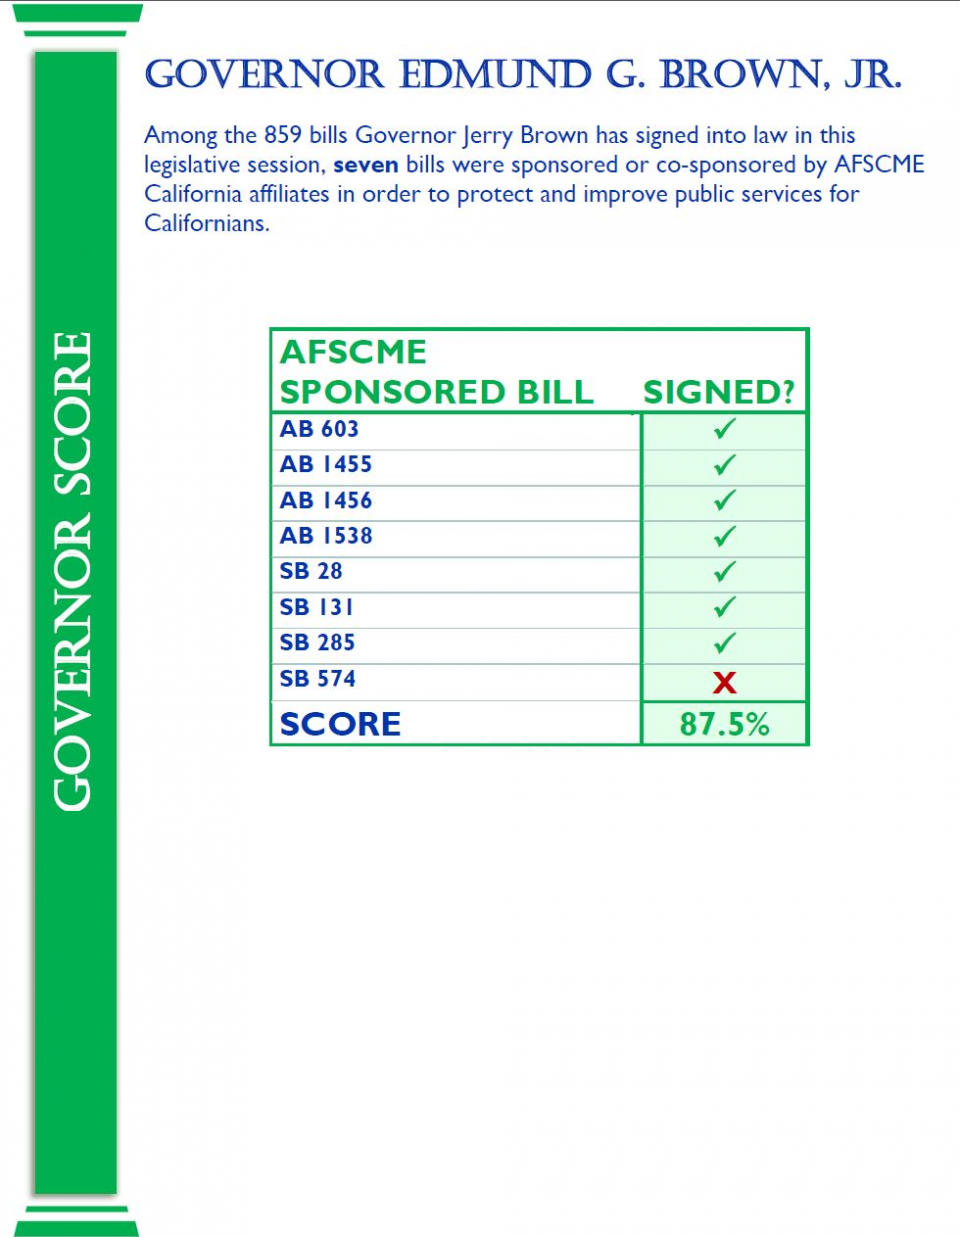 Comprehensive vote scores